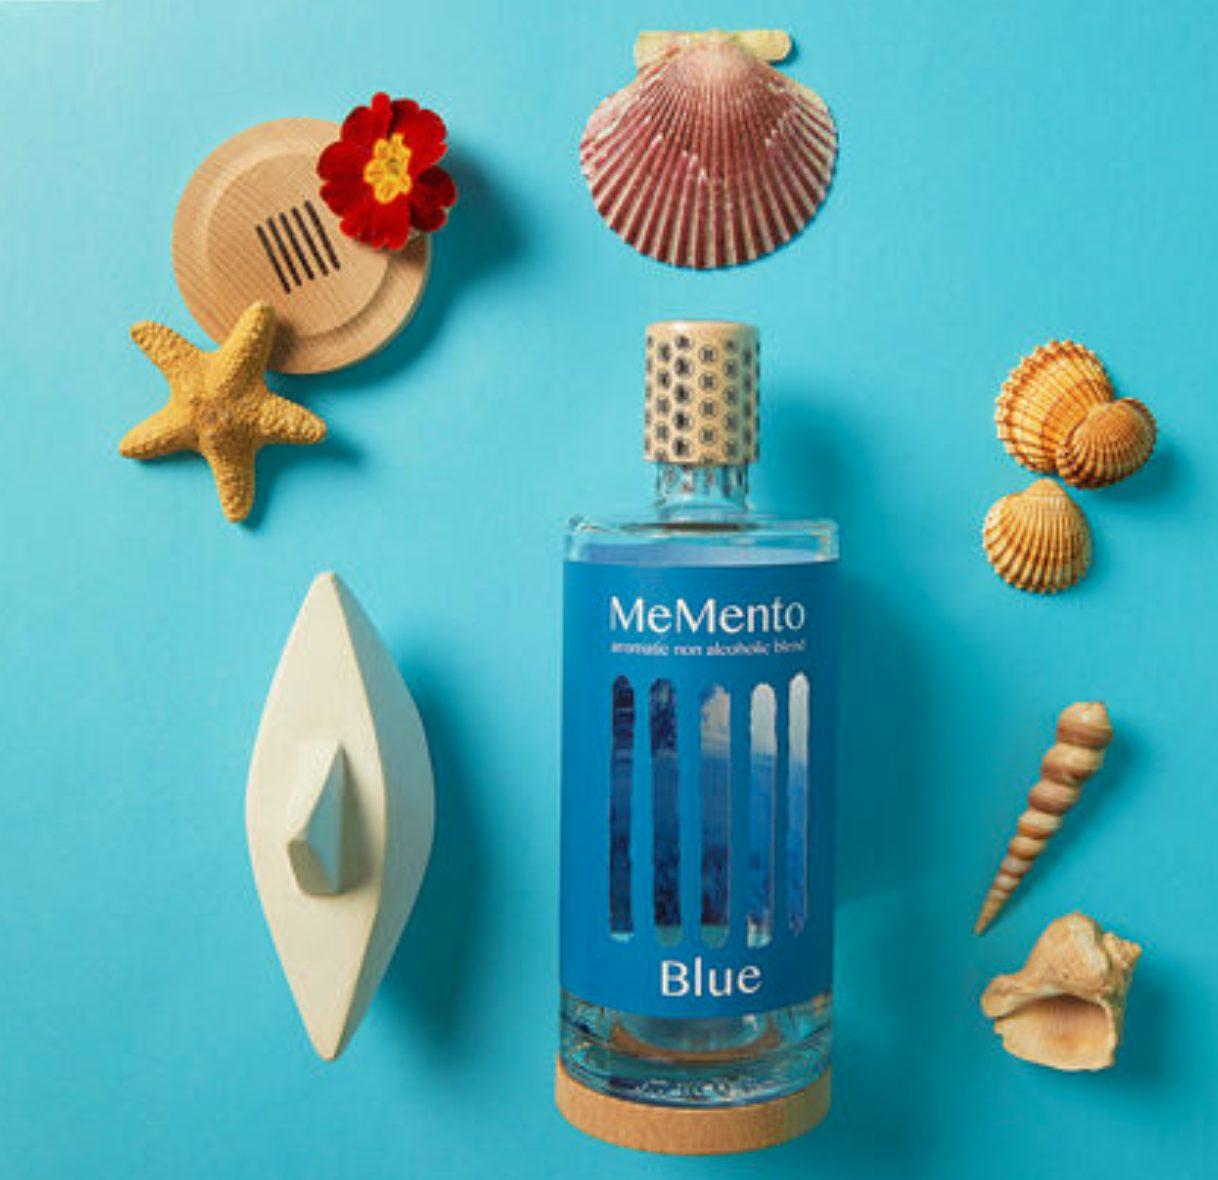 Capture decran 2021 05 26 a 10.08.48 - Memento Blue : un spiritueux marin sans alcool